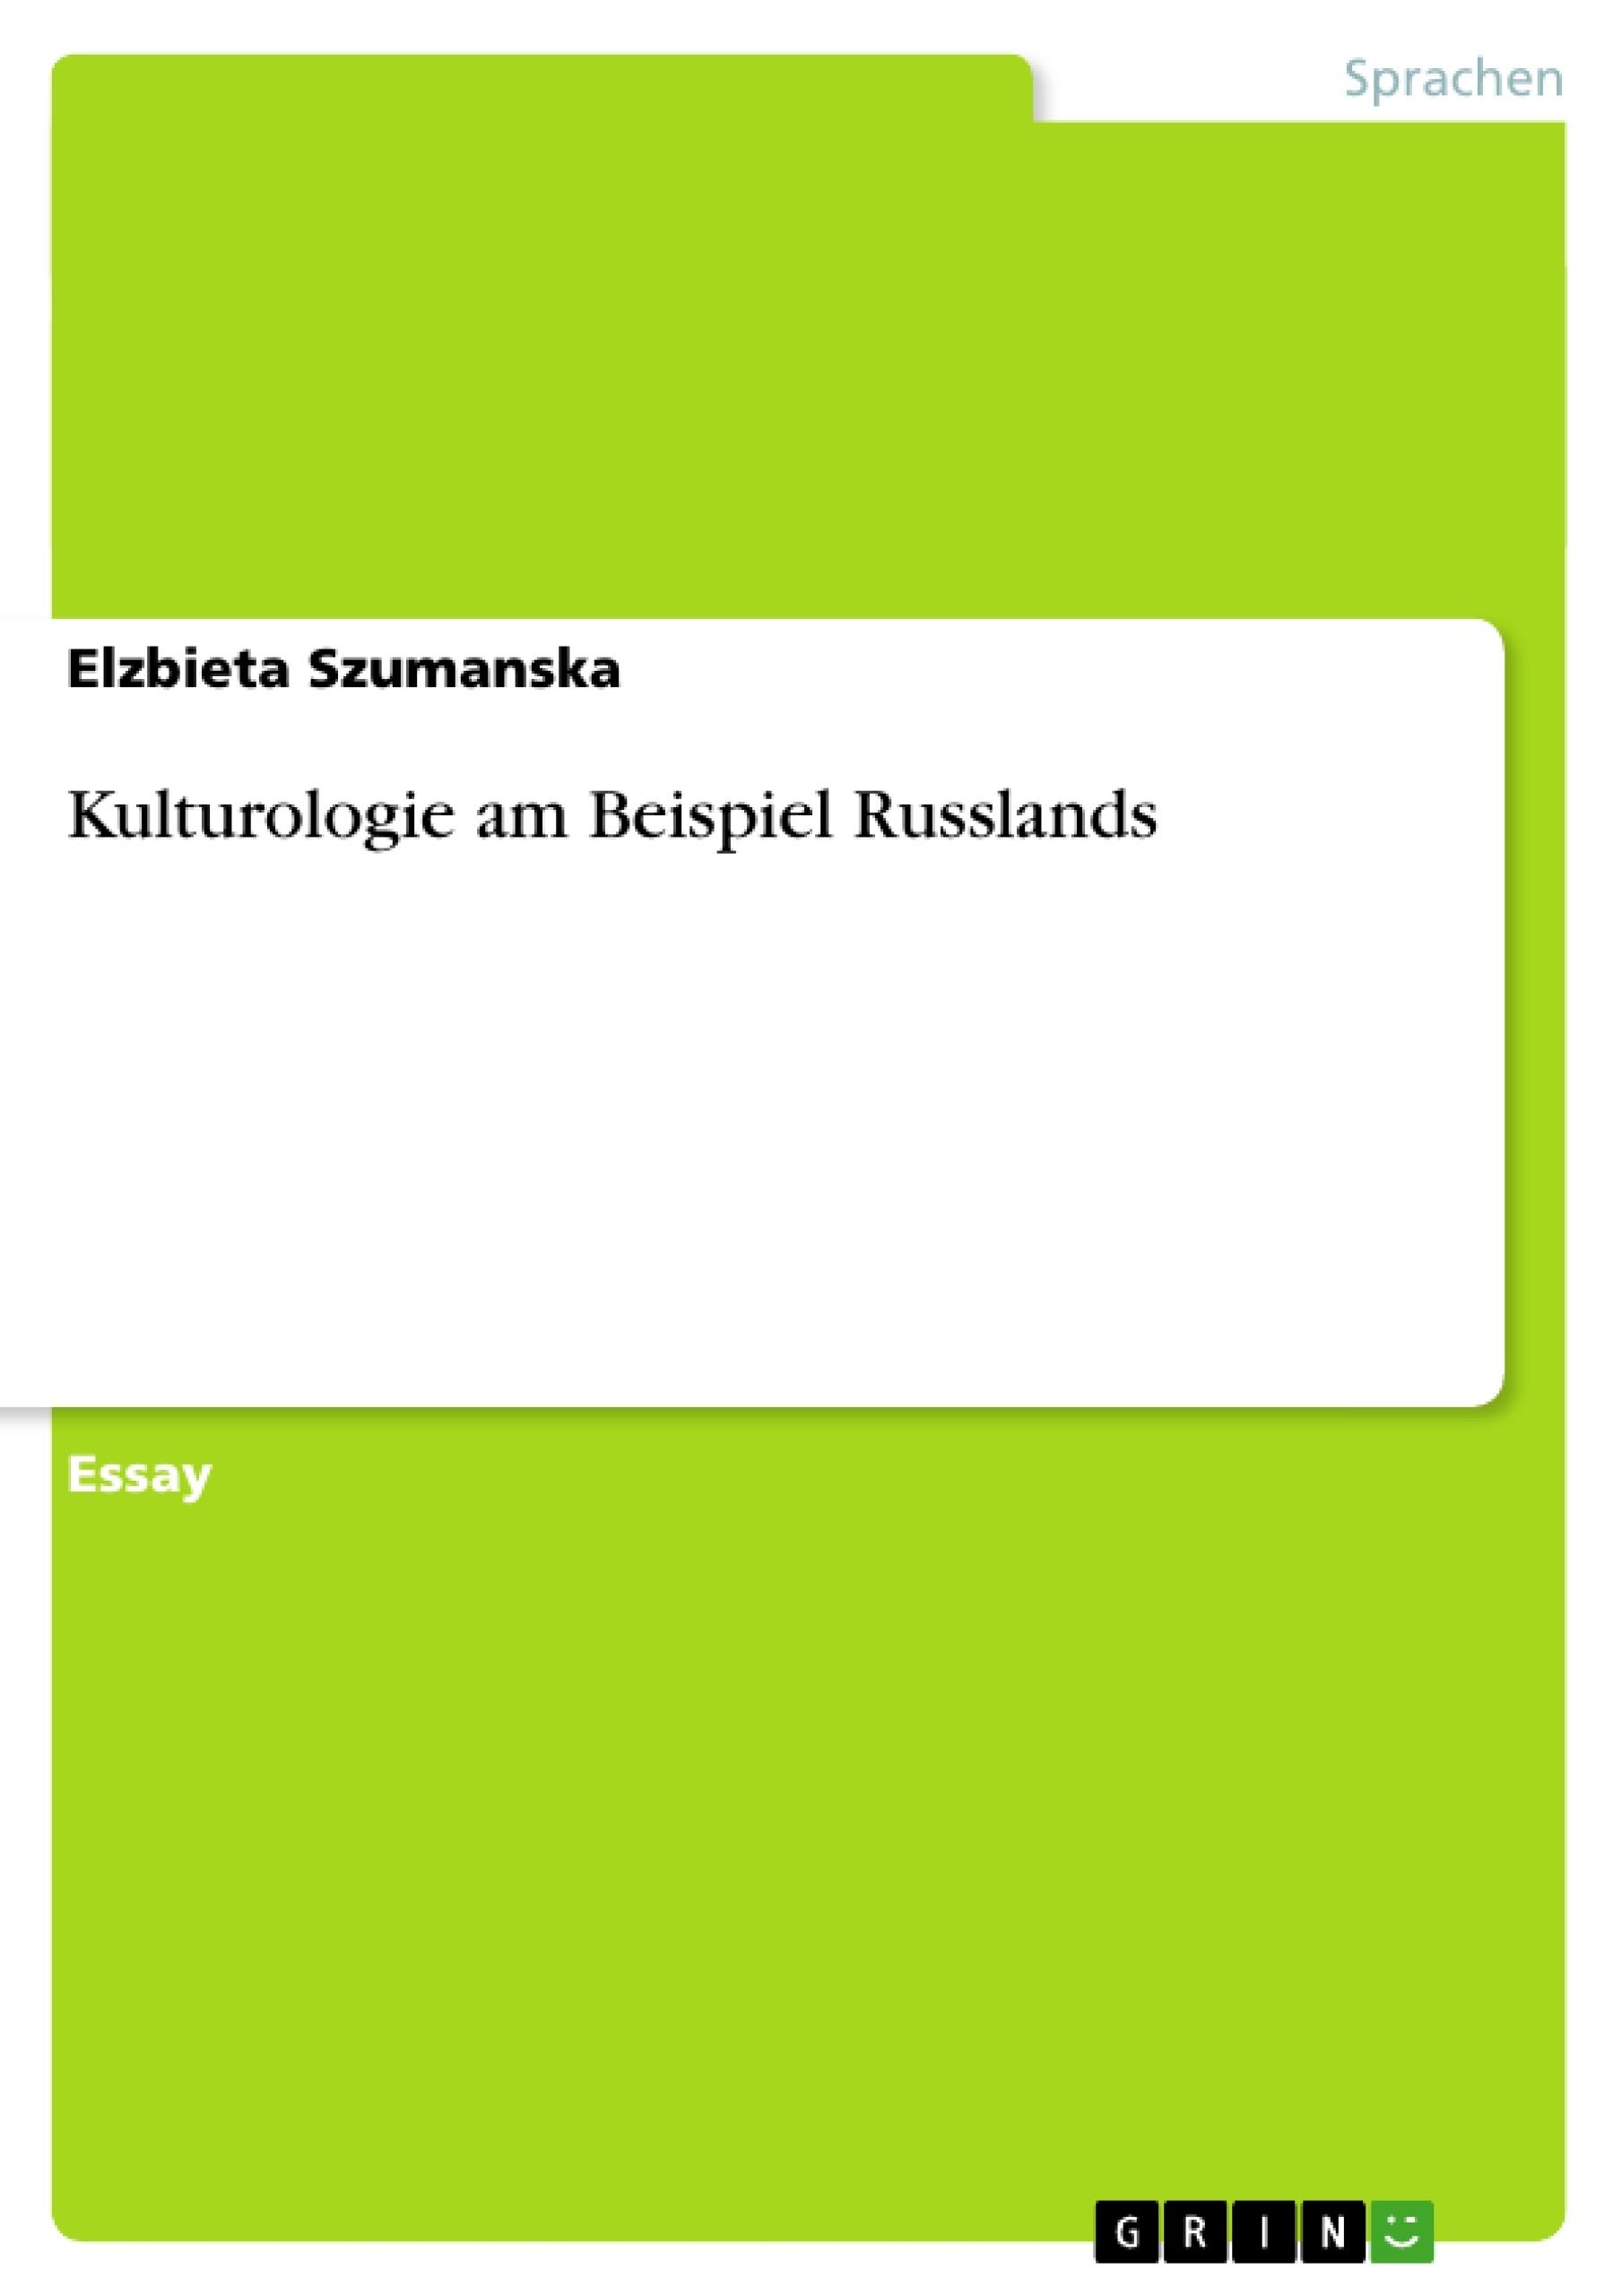 Titel: Kulturologie am Beispiel Russlands